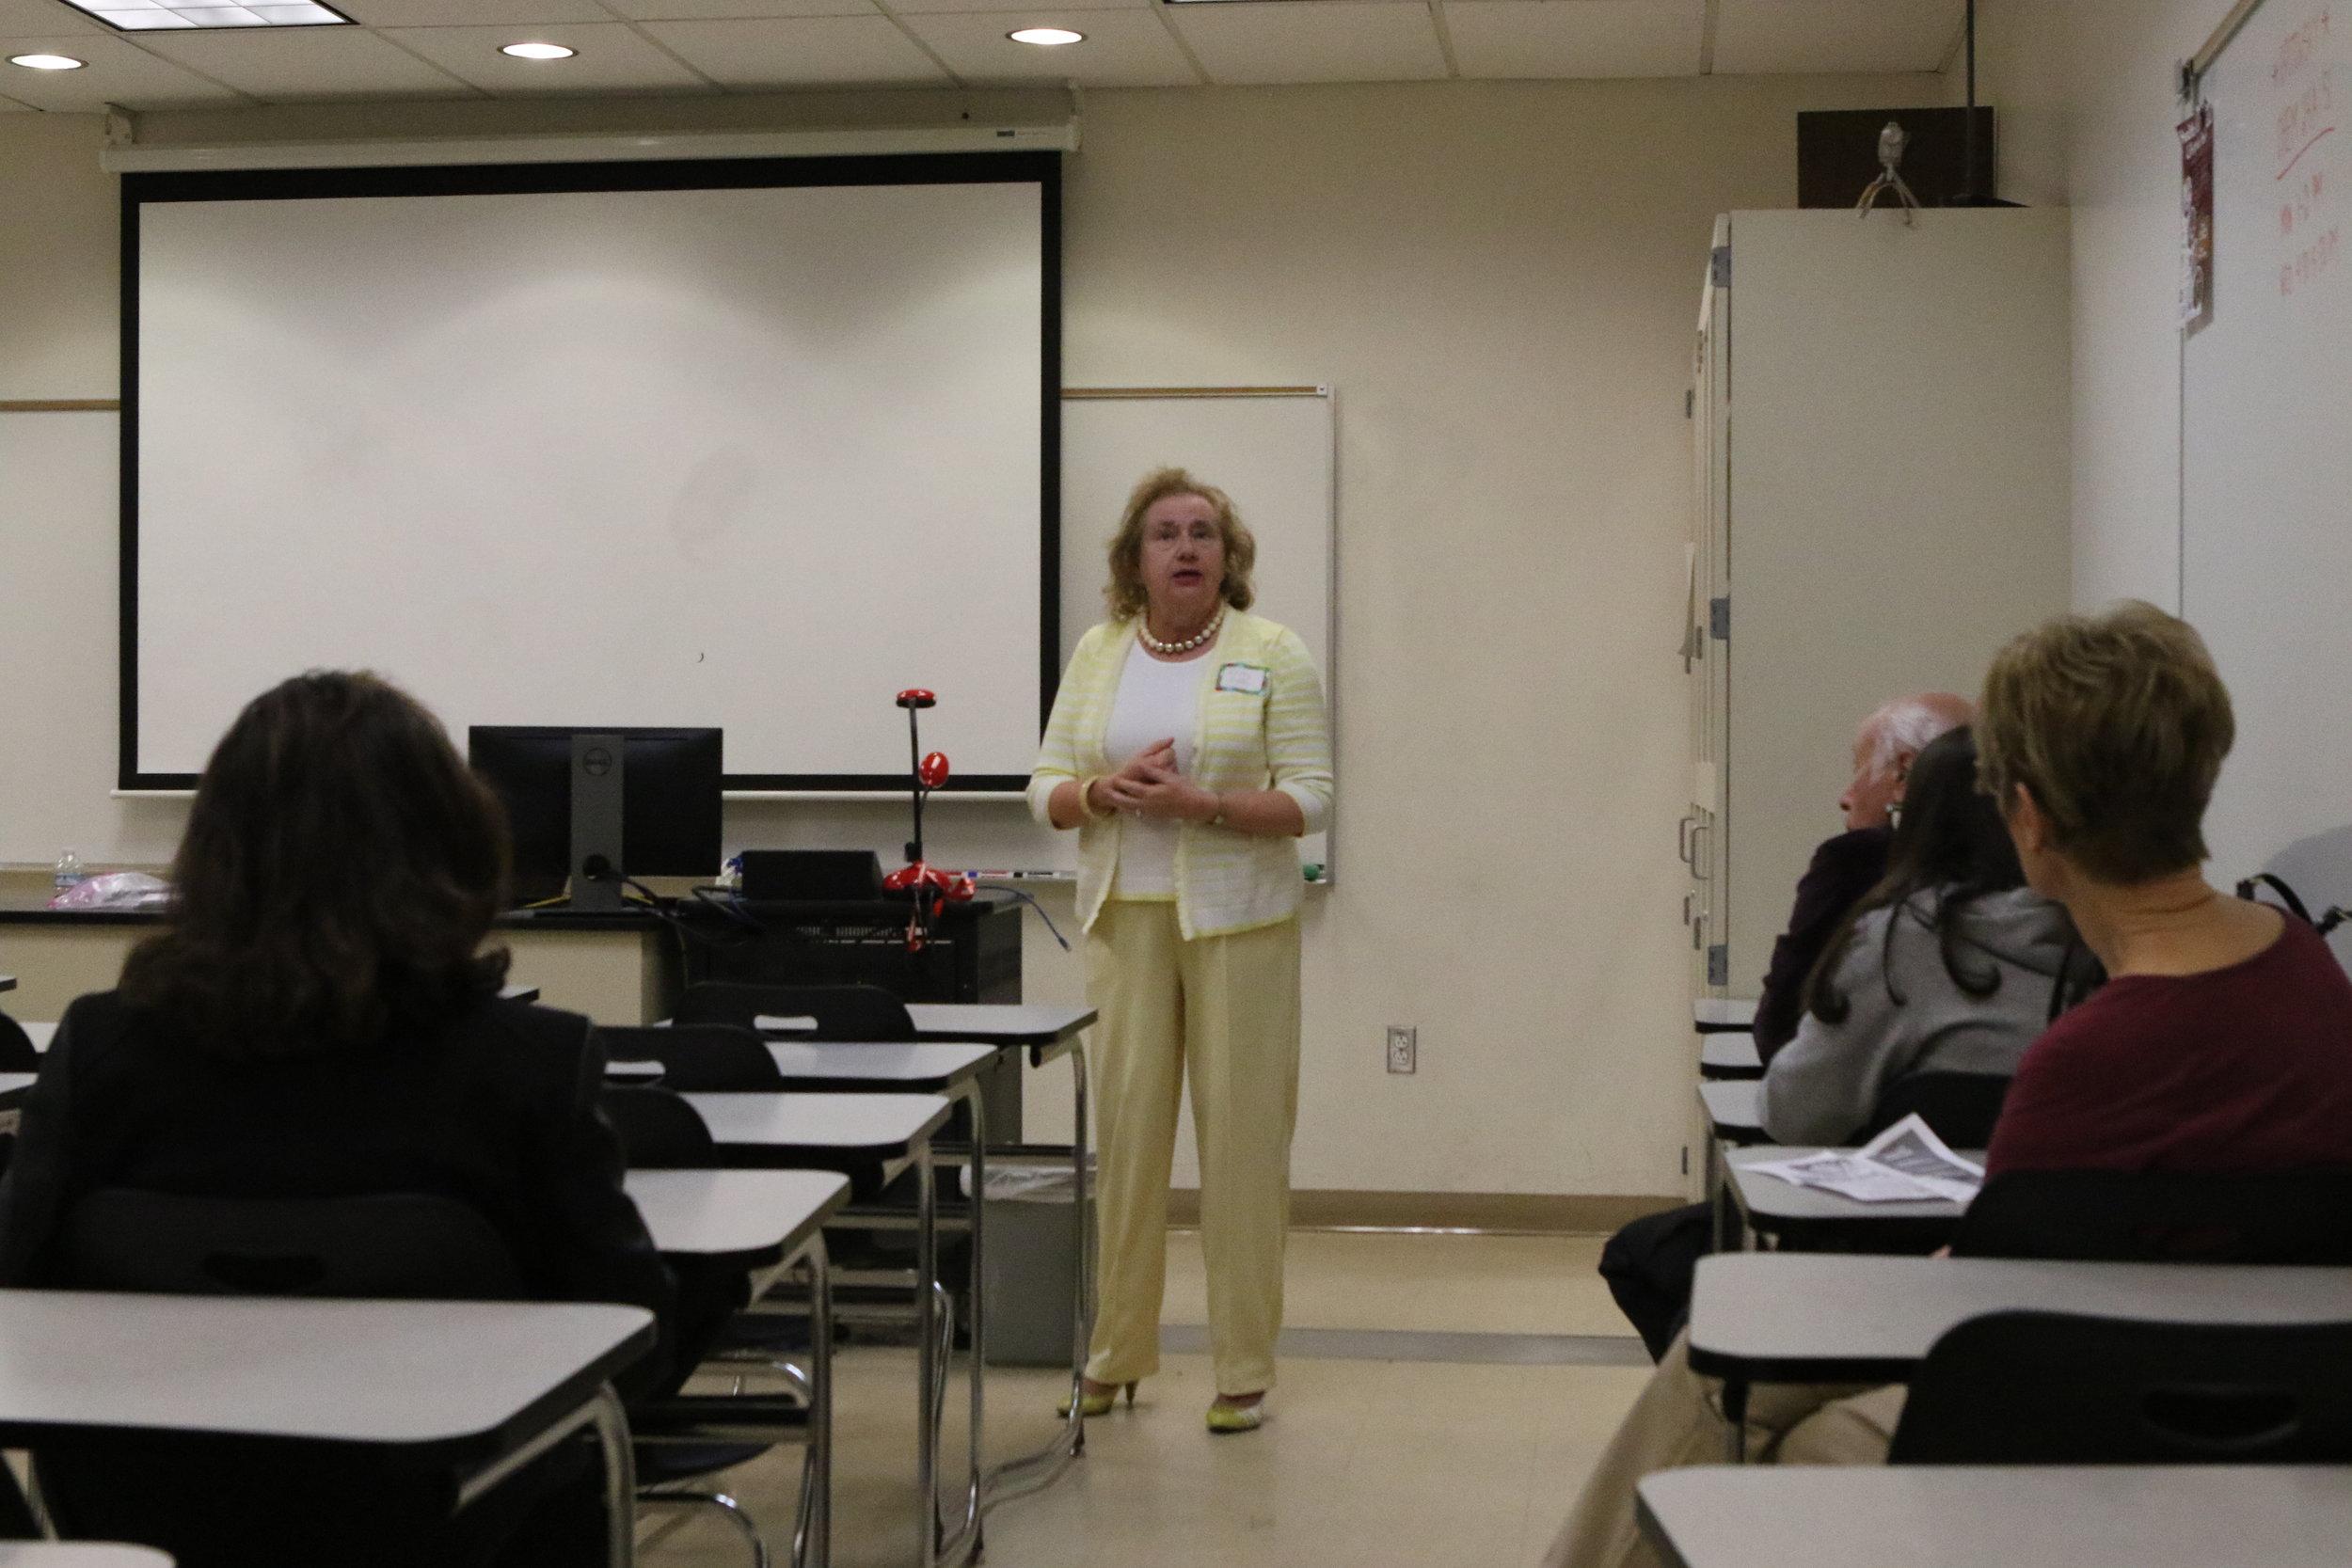 Tech Trek President Kathy Kinley introducing herself.  Photo by Brody Salazar